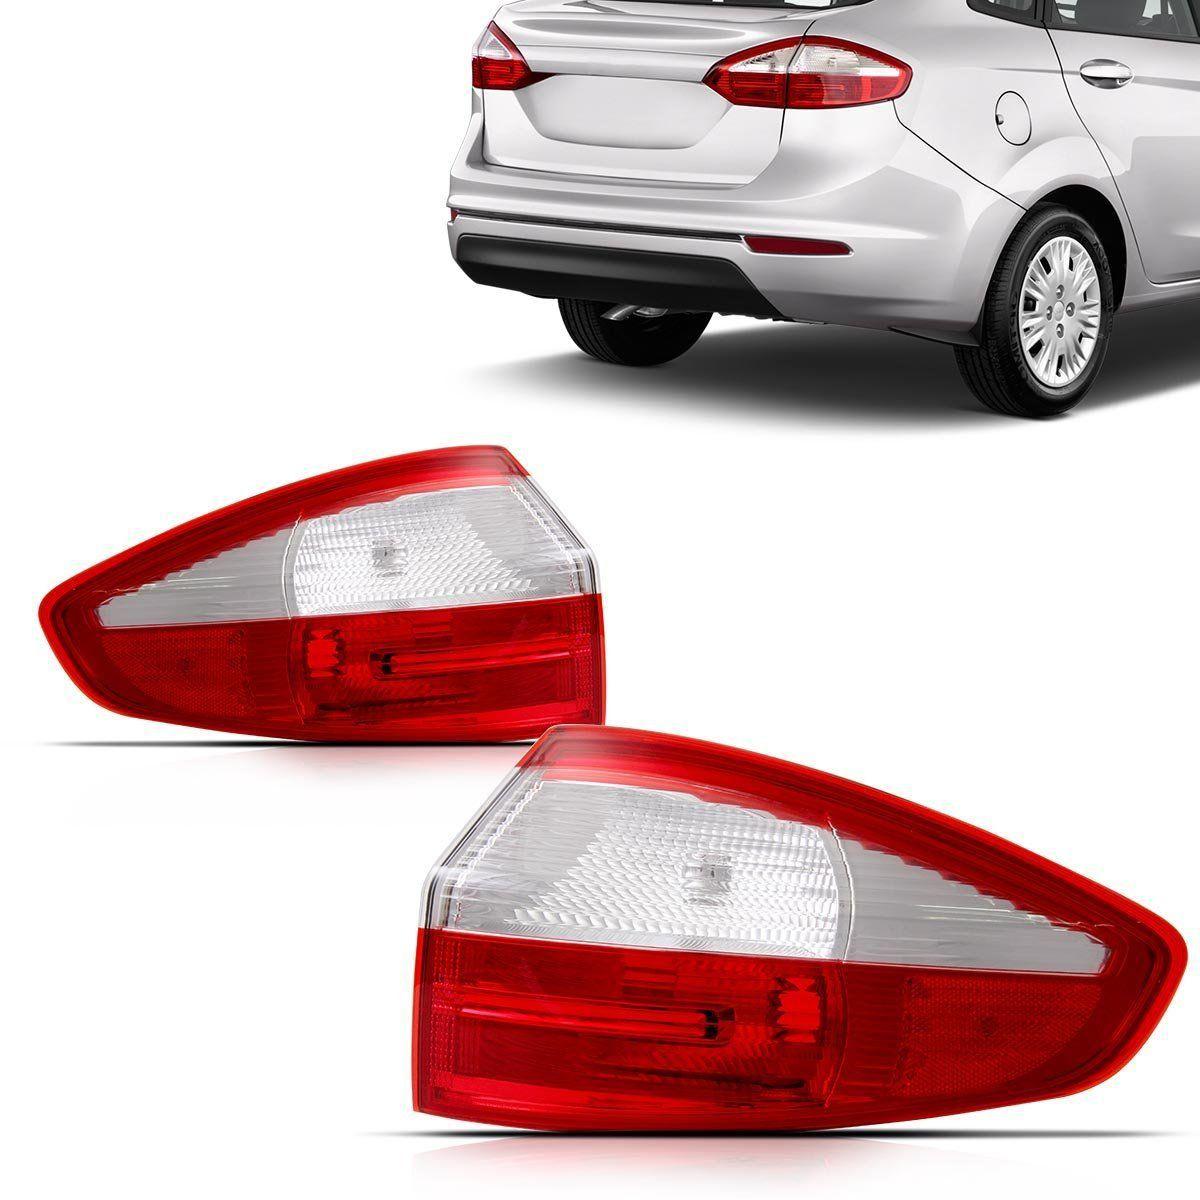 Lanterna New Fiesta Sedan 2013 20014 2015 Canto